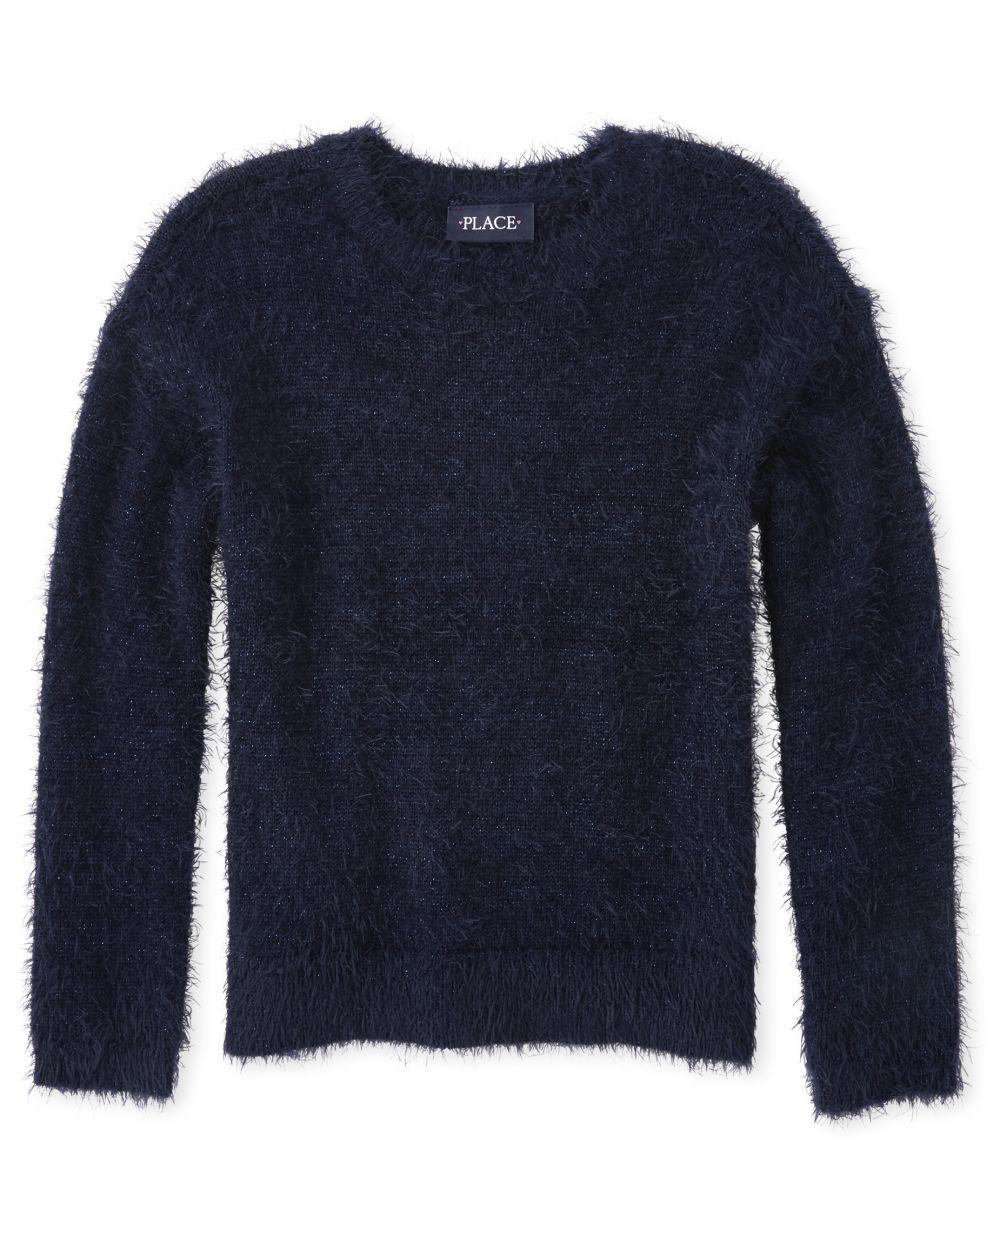 Girls Glitter Eyelash Sweater